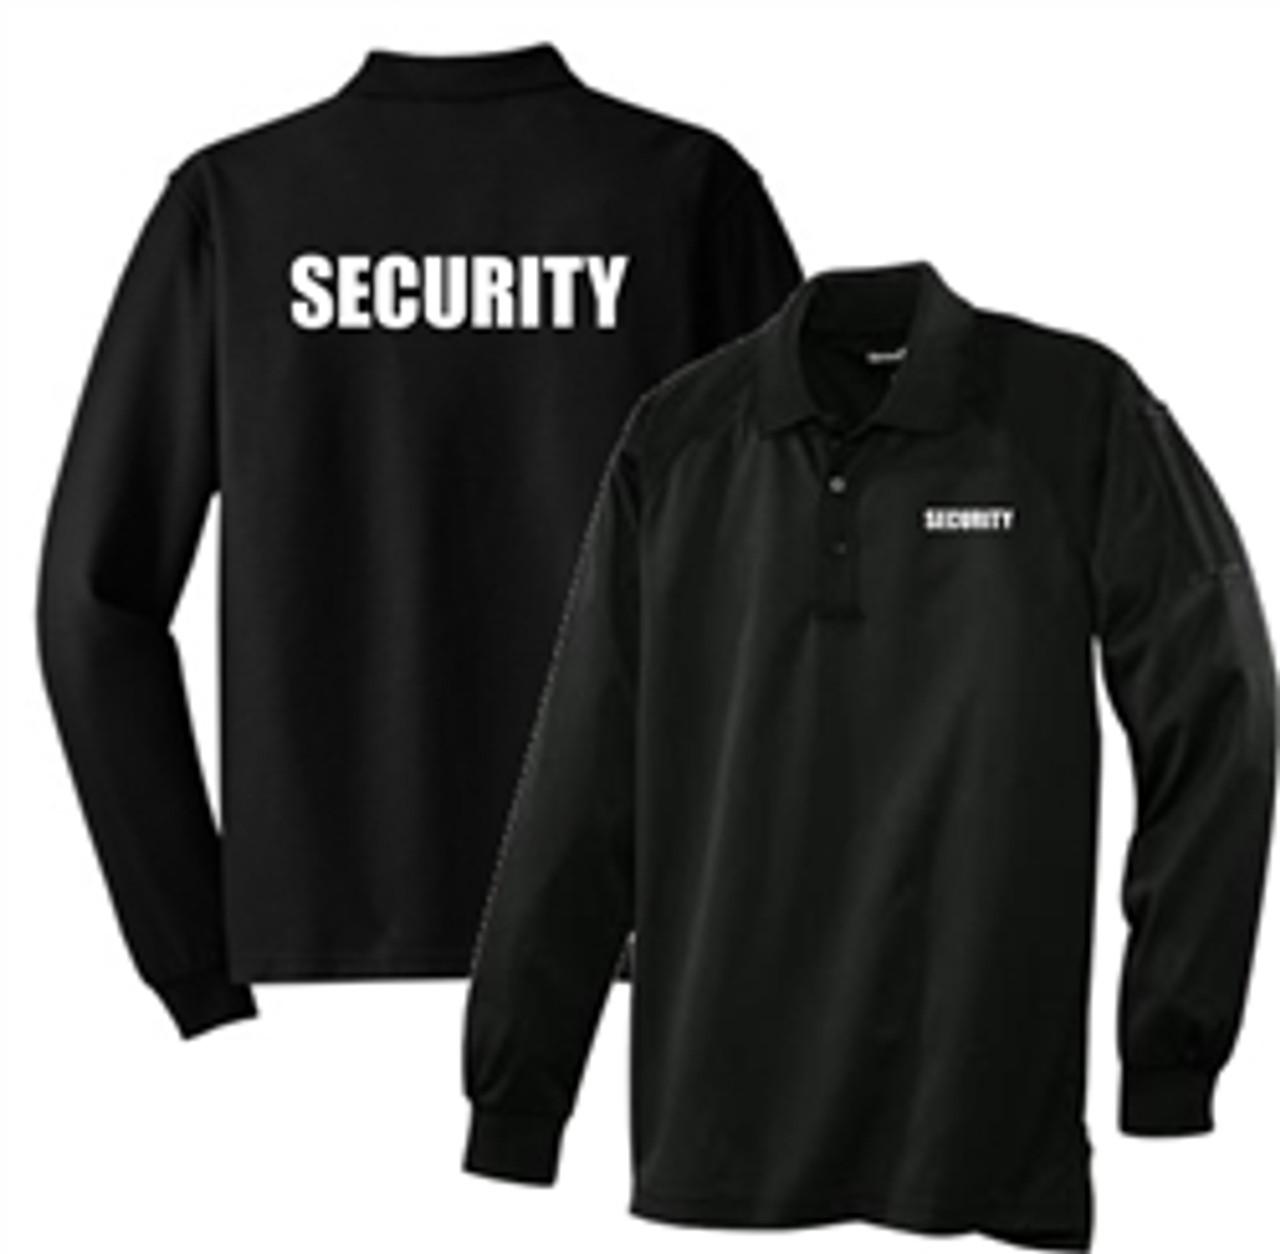 Security - Black Long Sleeve Tactical Polo